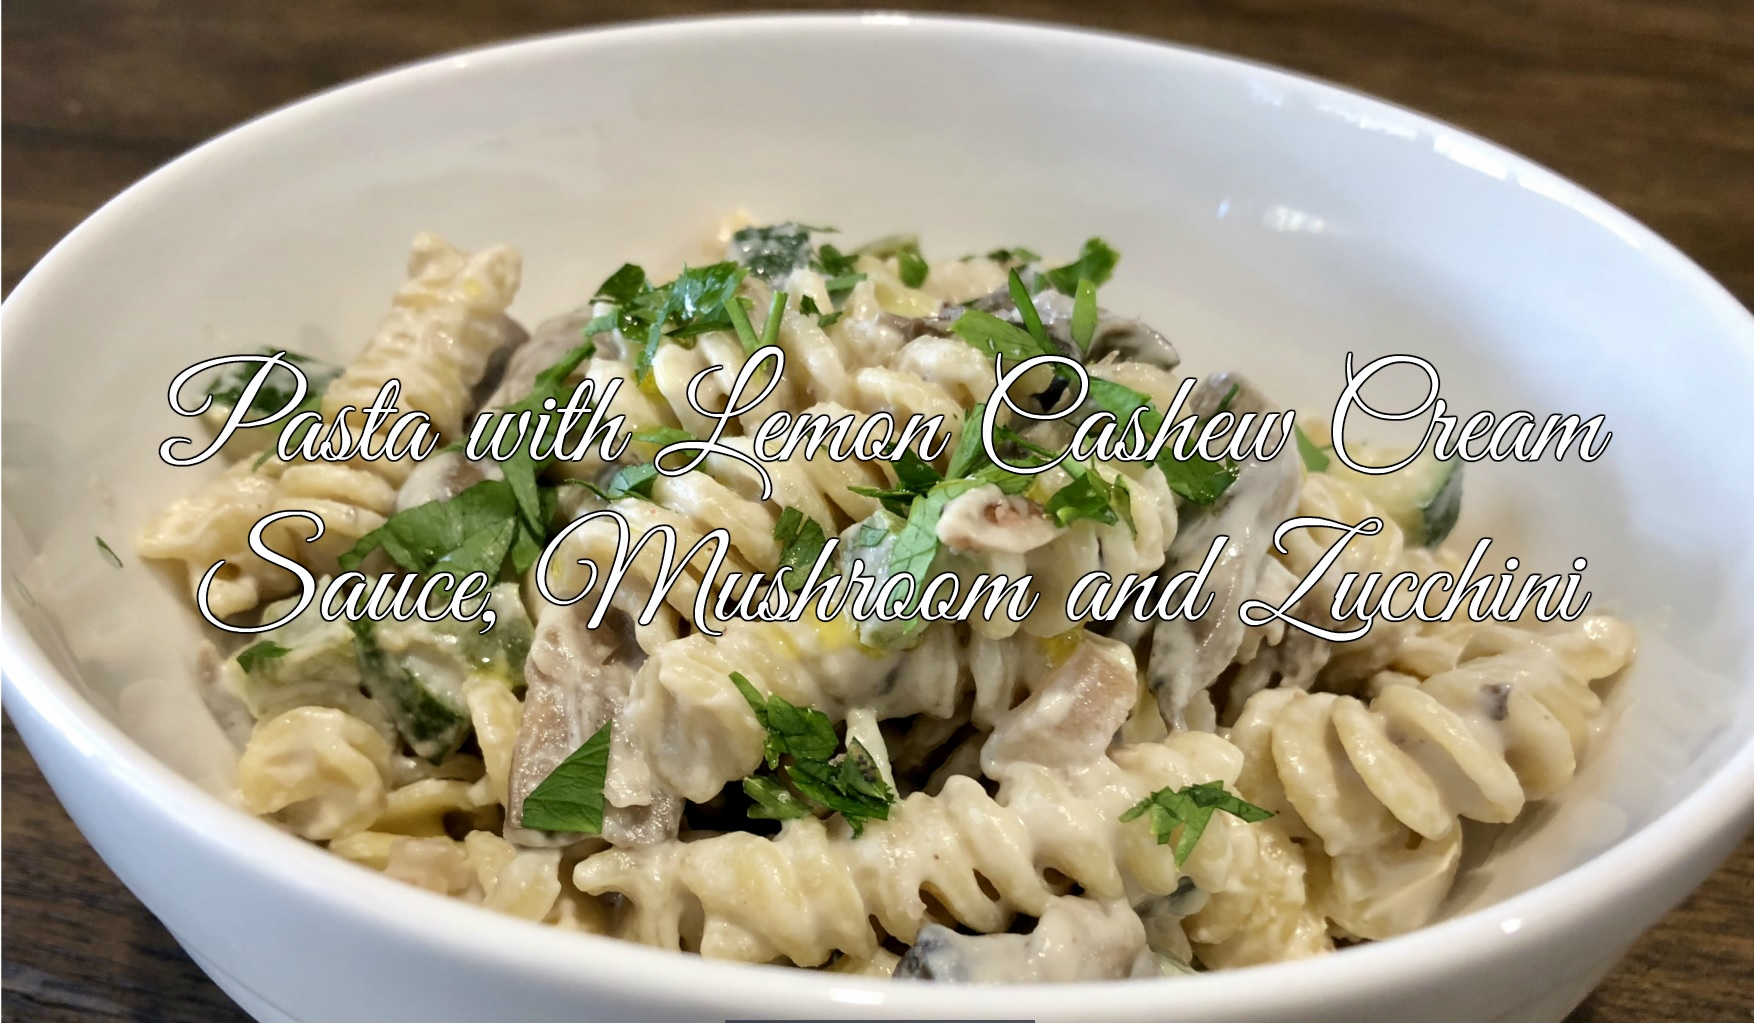 Pasta with Lemon Cashew Cream